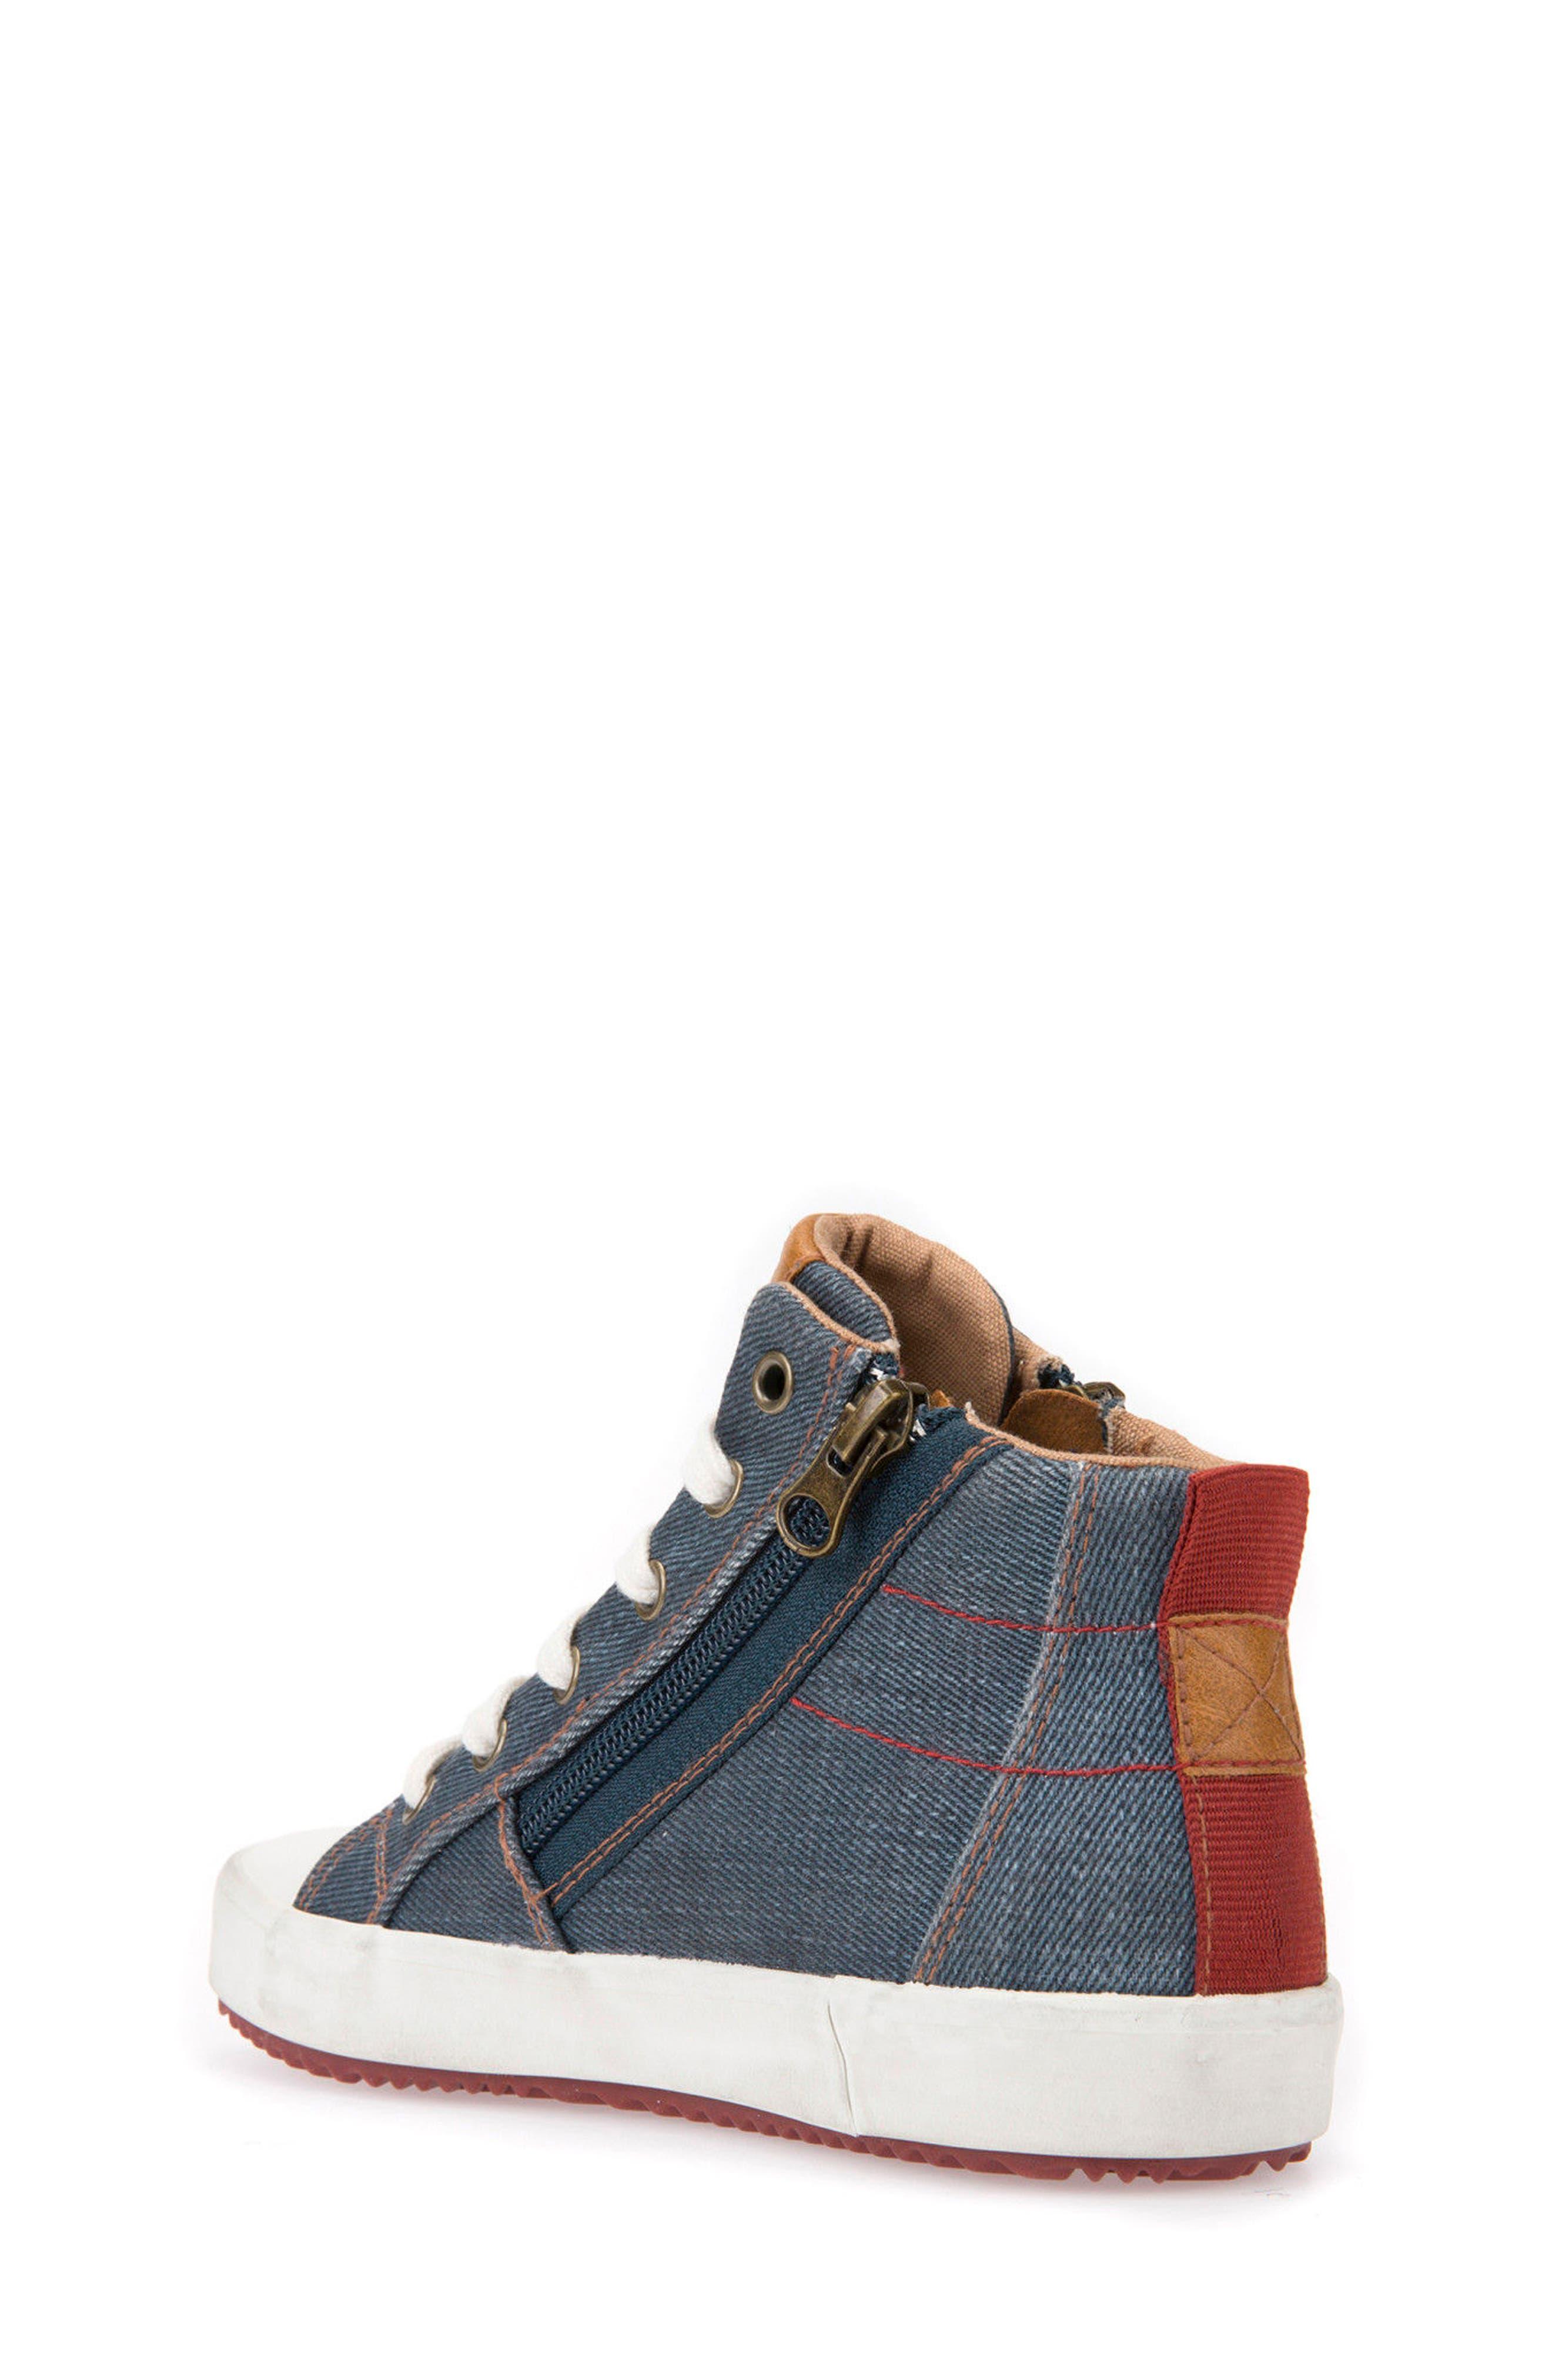 Alonisso High Top Sneaker,                             Alternate thumbnail 2, color,                             Blue/ Dark Red